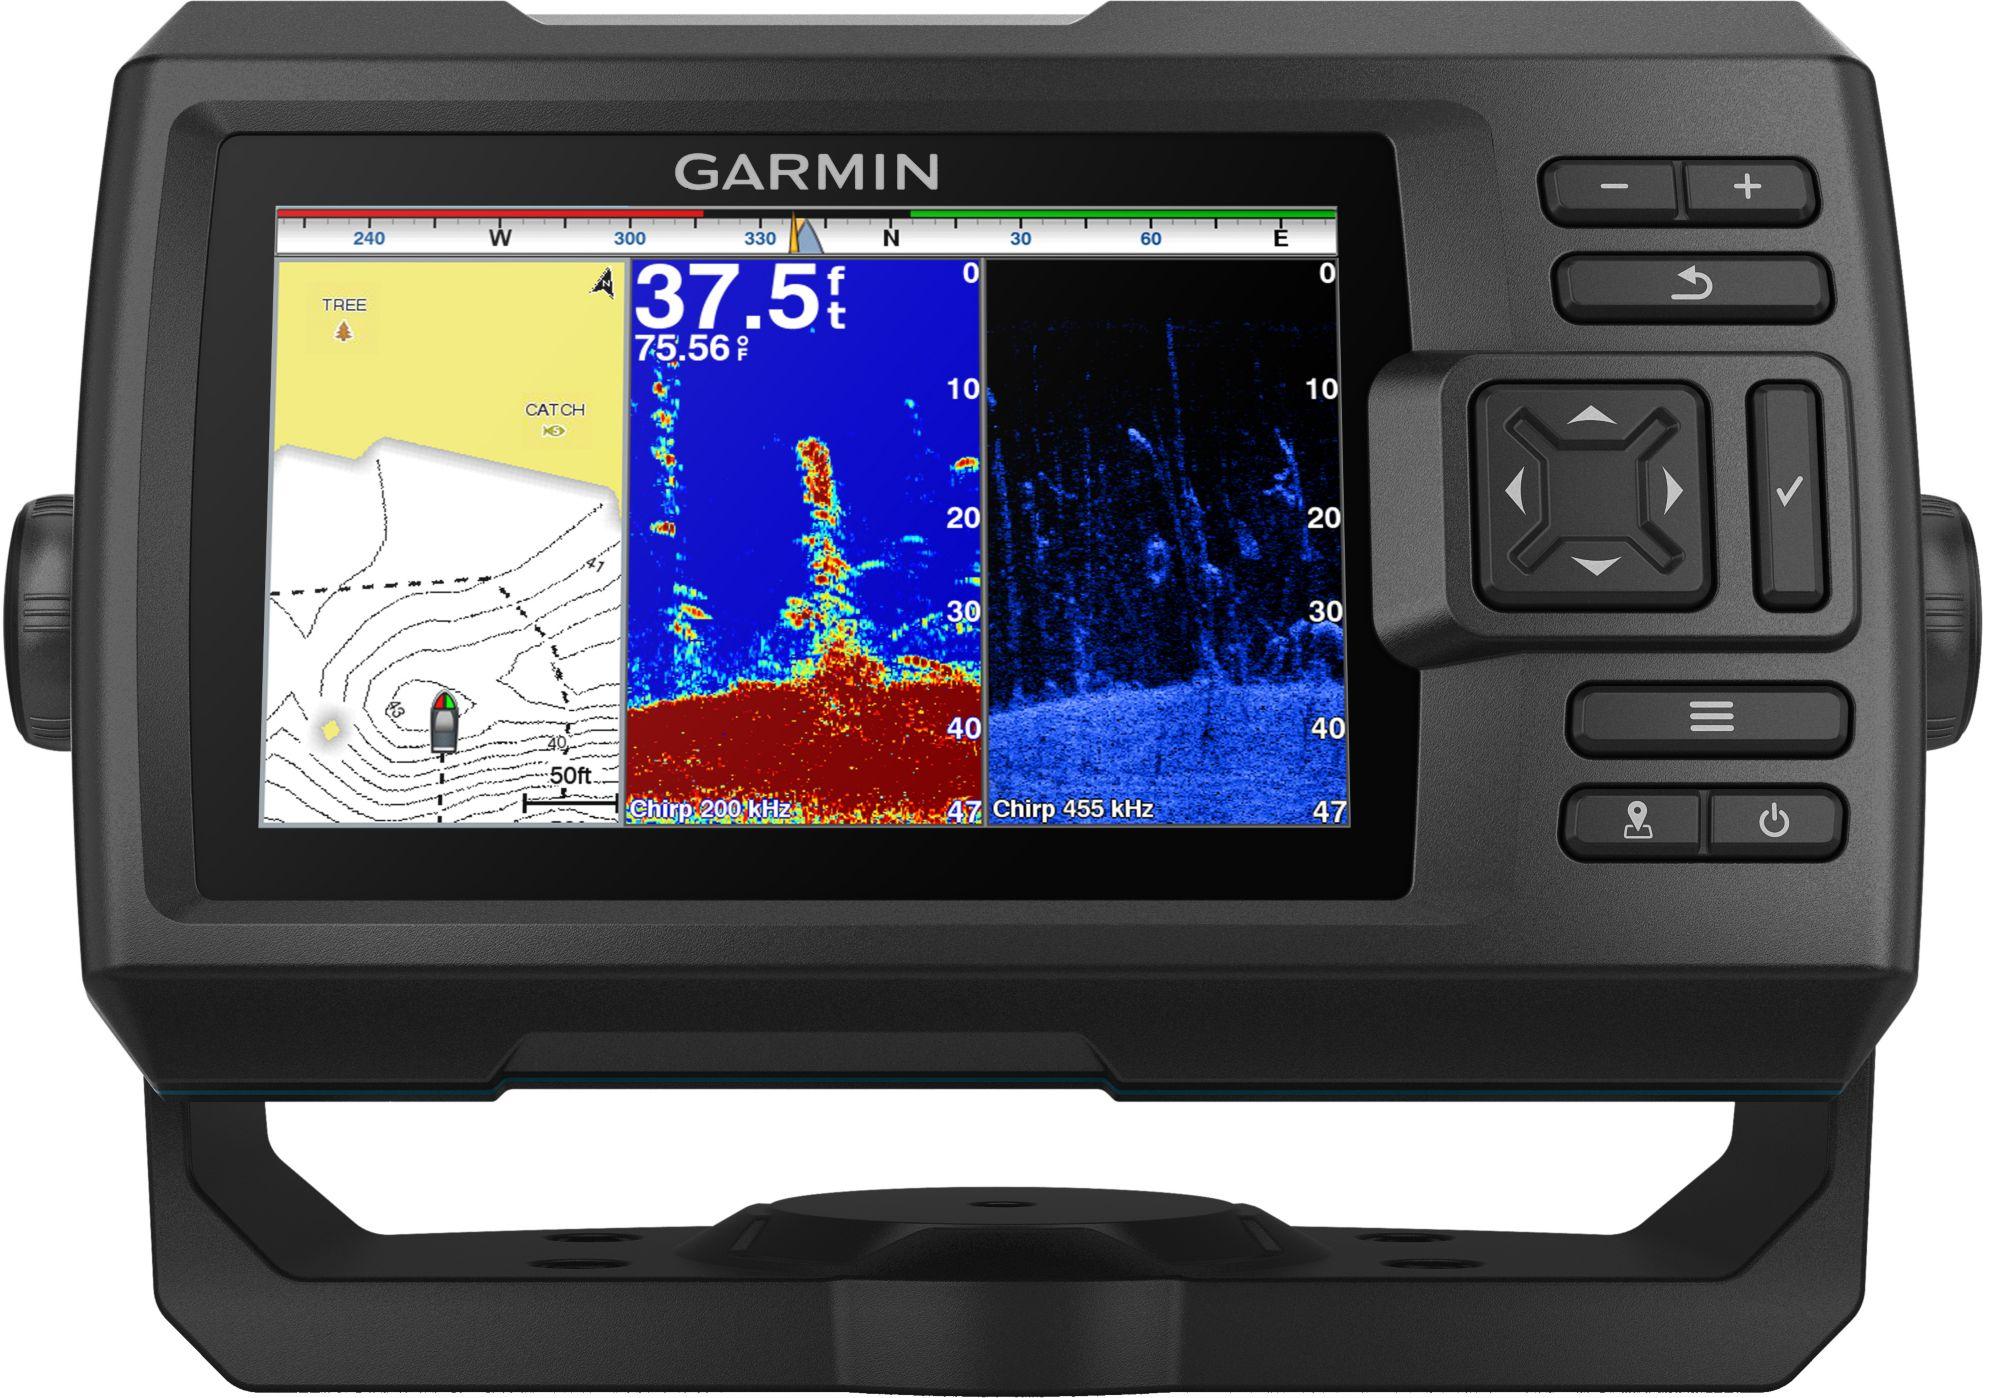 Garmin Striker Plus 5cv Wiring Diagram Automotive 4 Gps Fish Finder 010 01872 00 Dick S Rh Dickssportinggoods Com